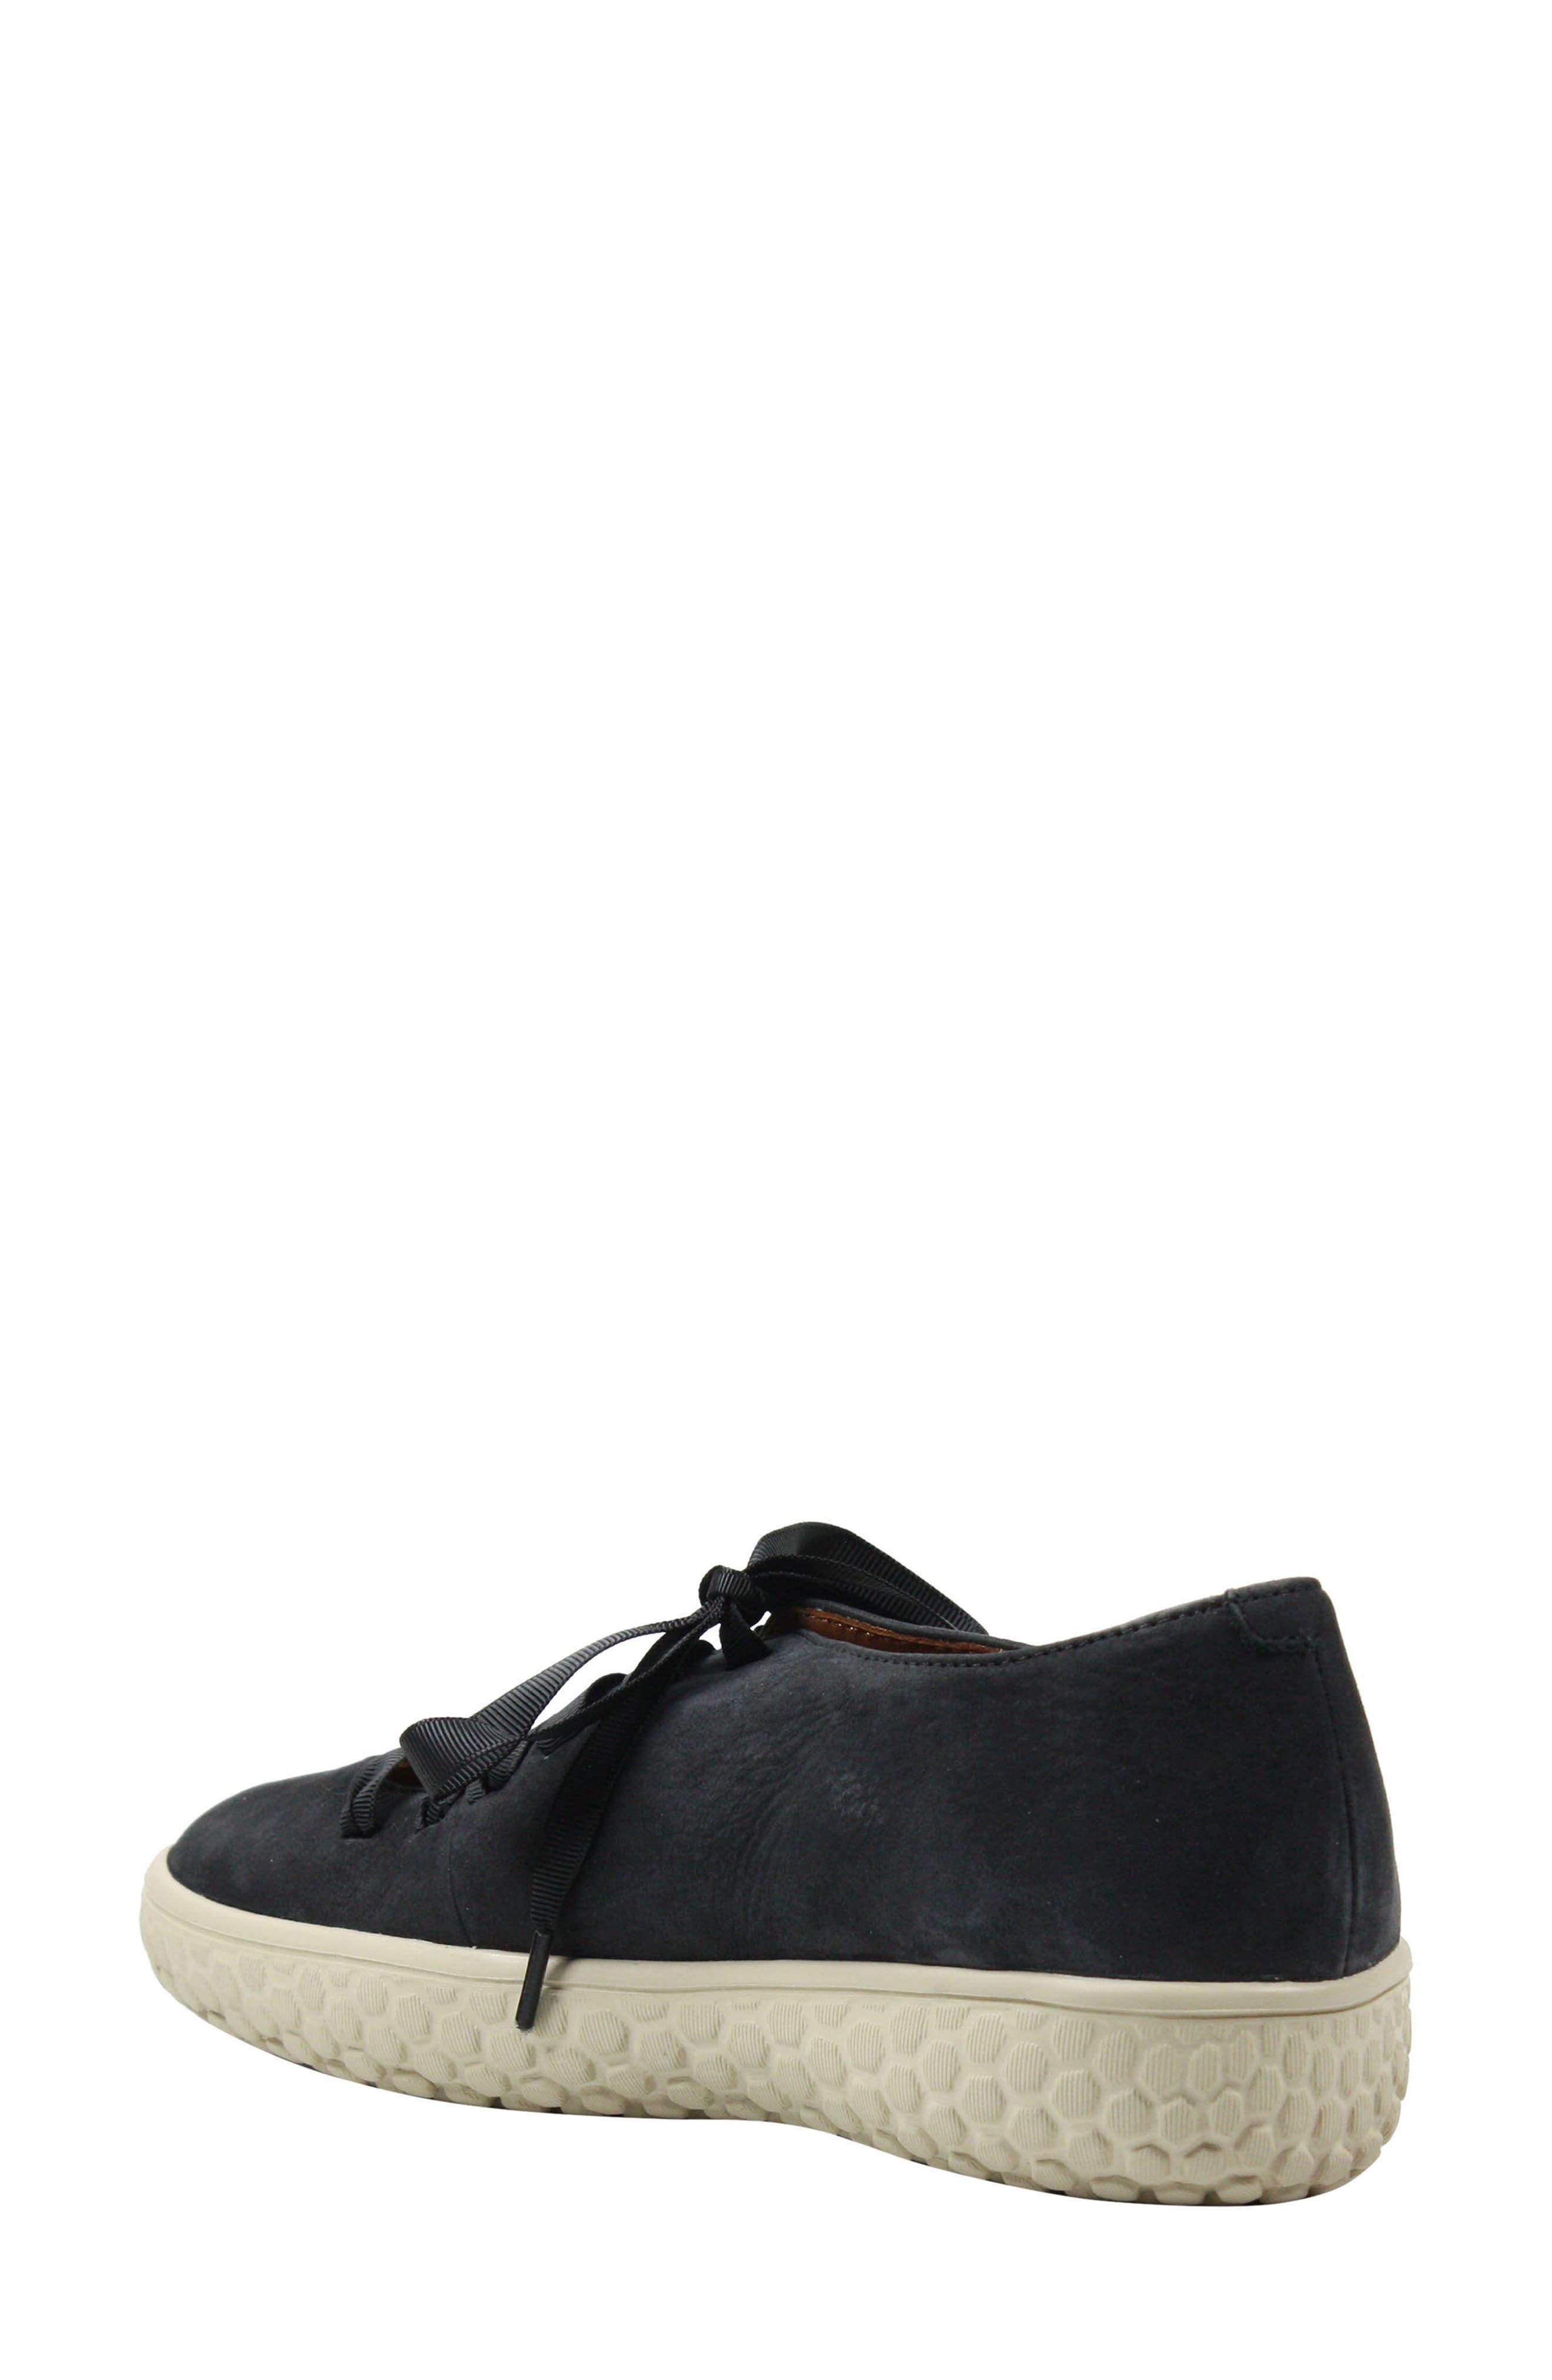 L'AMOUR DES PIEDS, Zaheera Sneaker, Alternate thumbnail 2, color, BLACK NUBUCK LEATHER